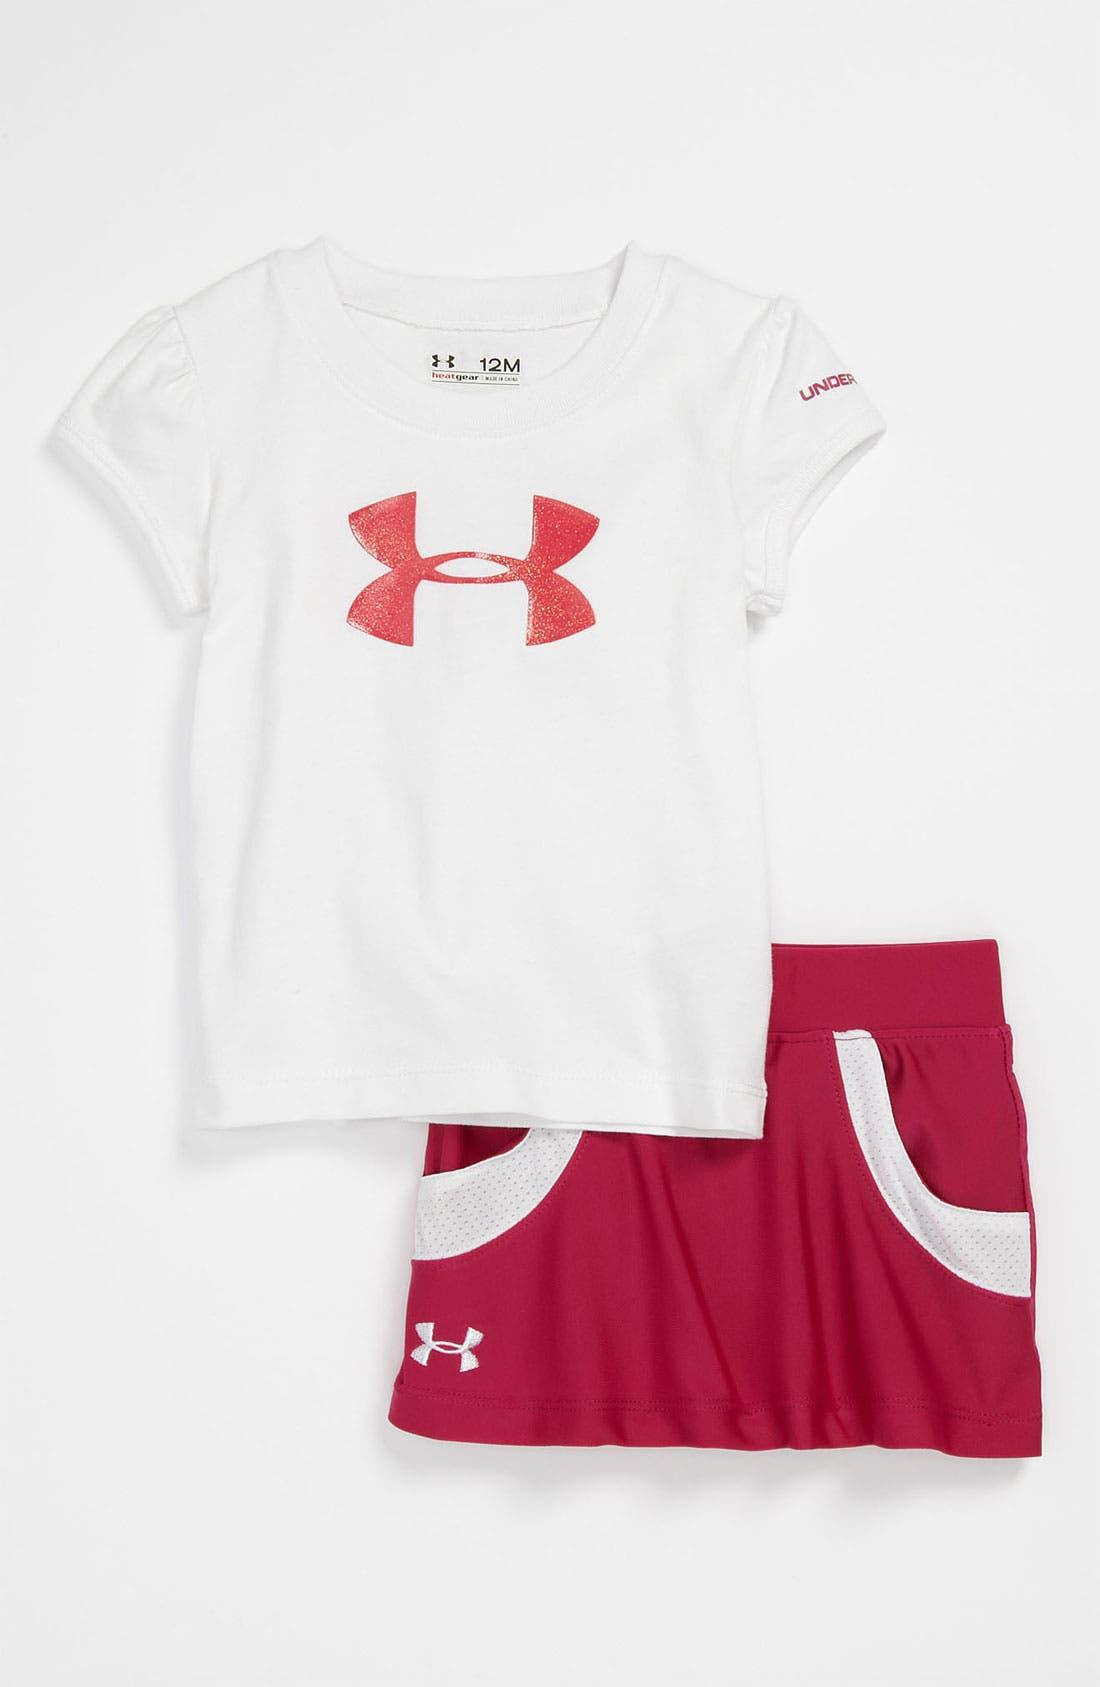 Alternate Image 1 Selected - Under Armour Shirt & Skirt (Infant)